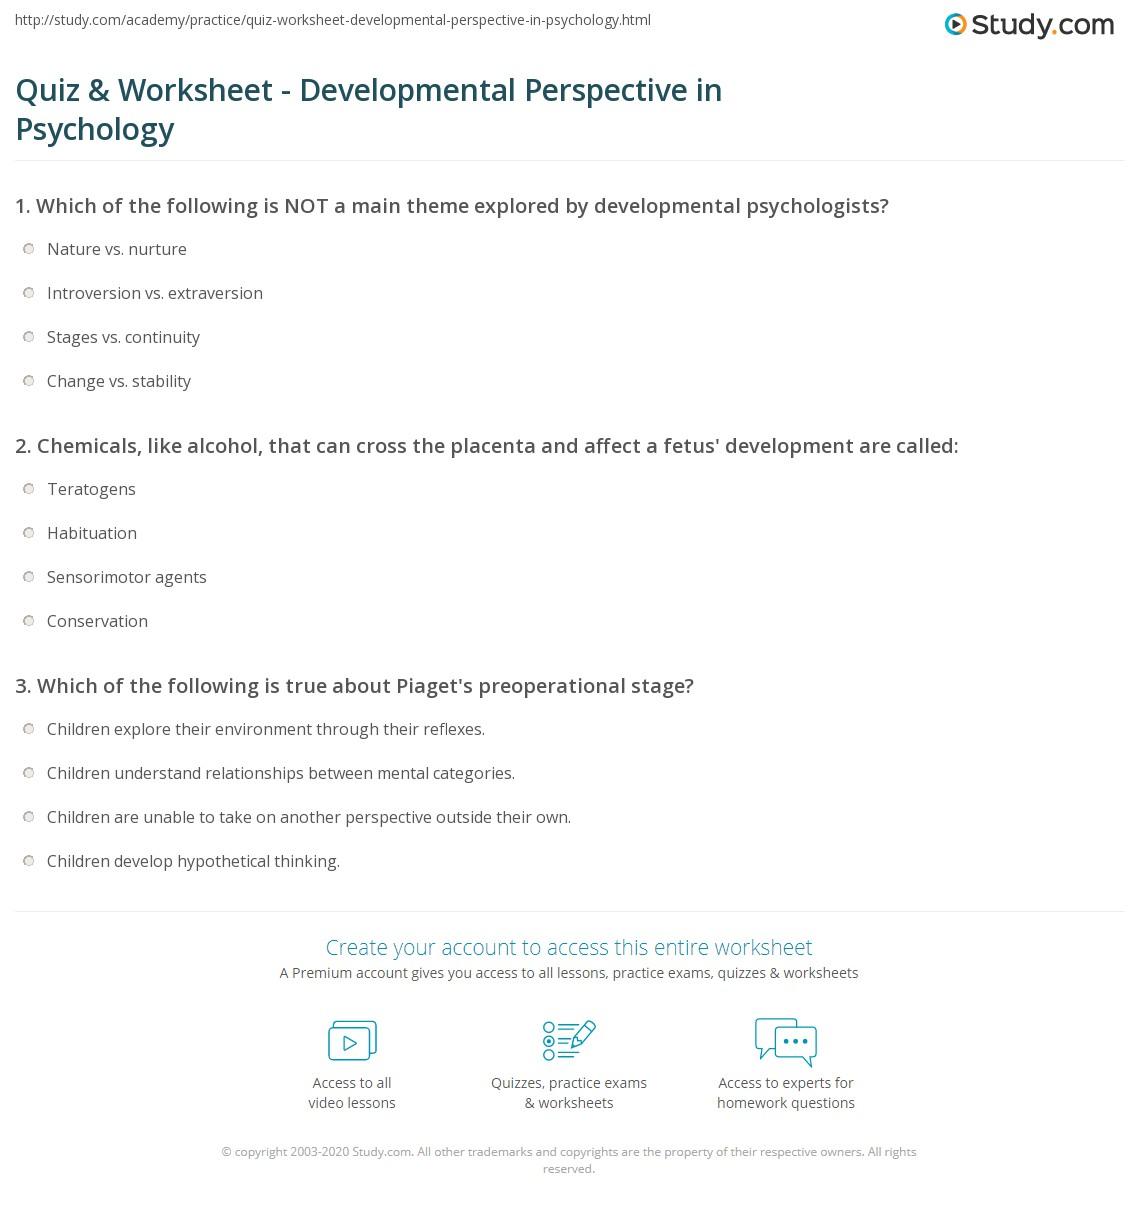 Workbooks psychology worksheets : Quiz & Worksheet - Developmental Perspective in Psychology | Study.com